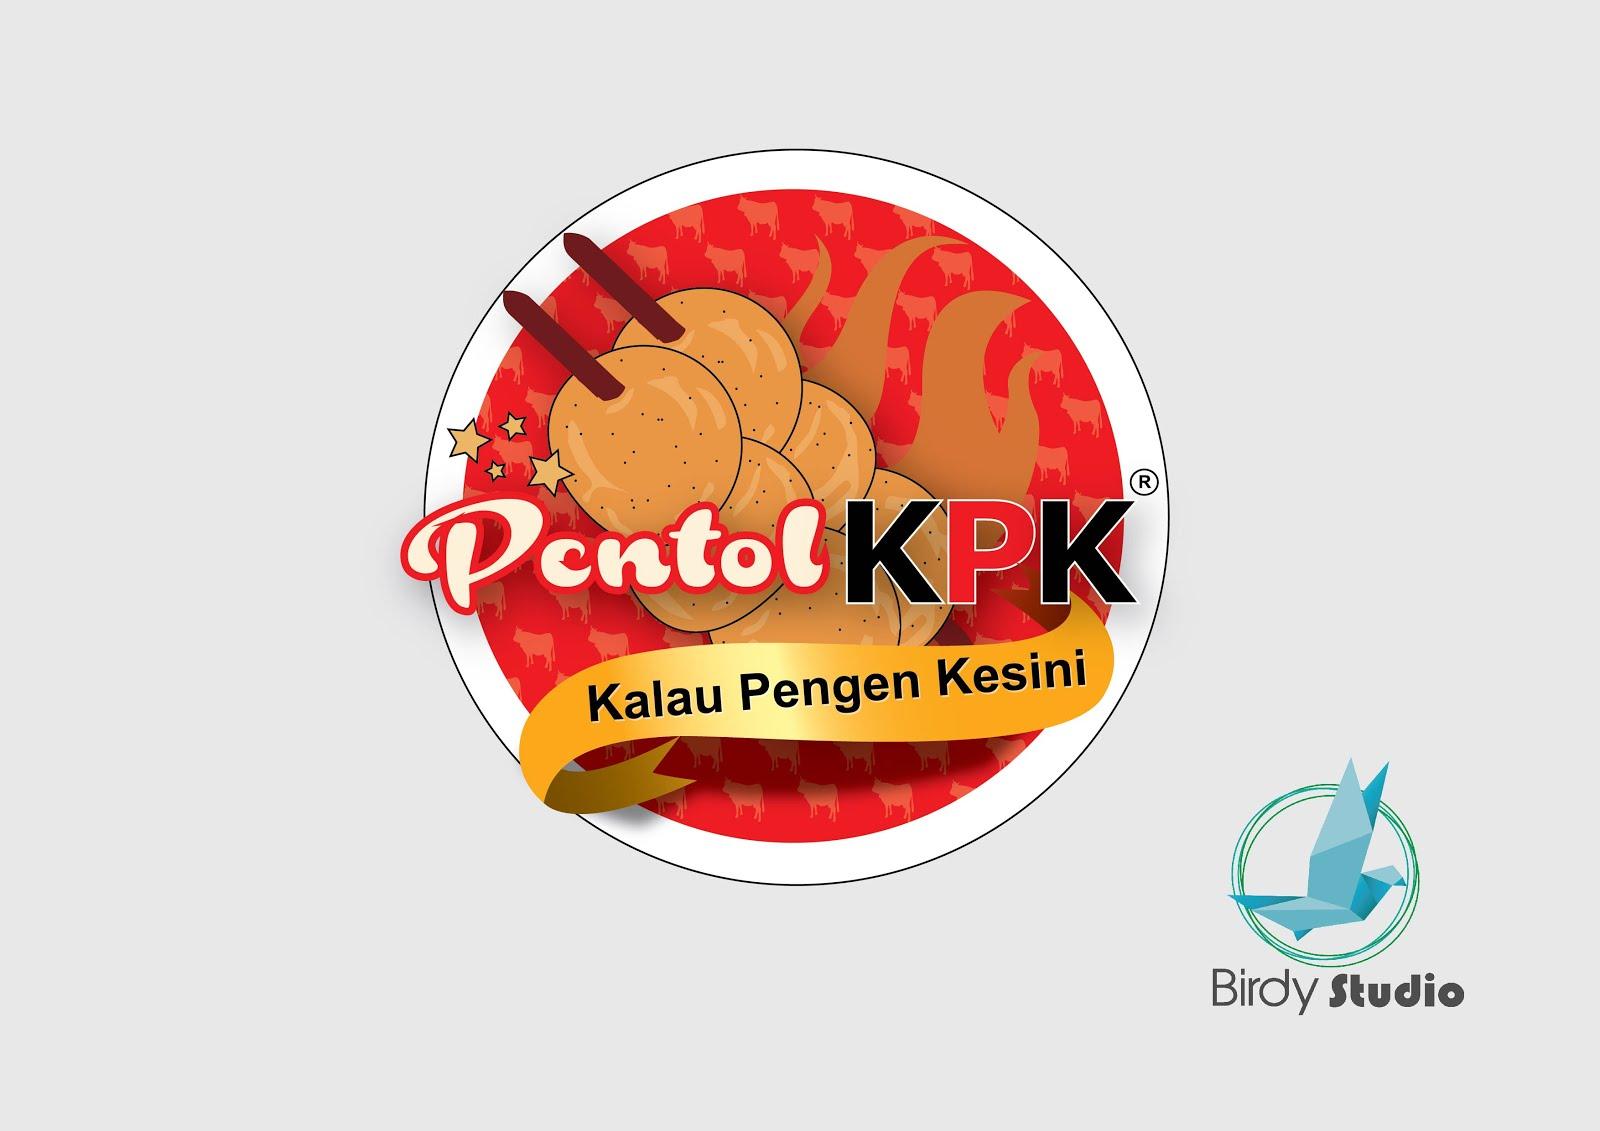 KPK Detail: Logo Pentol KPK